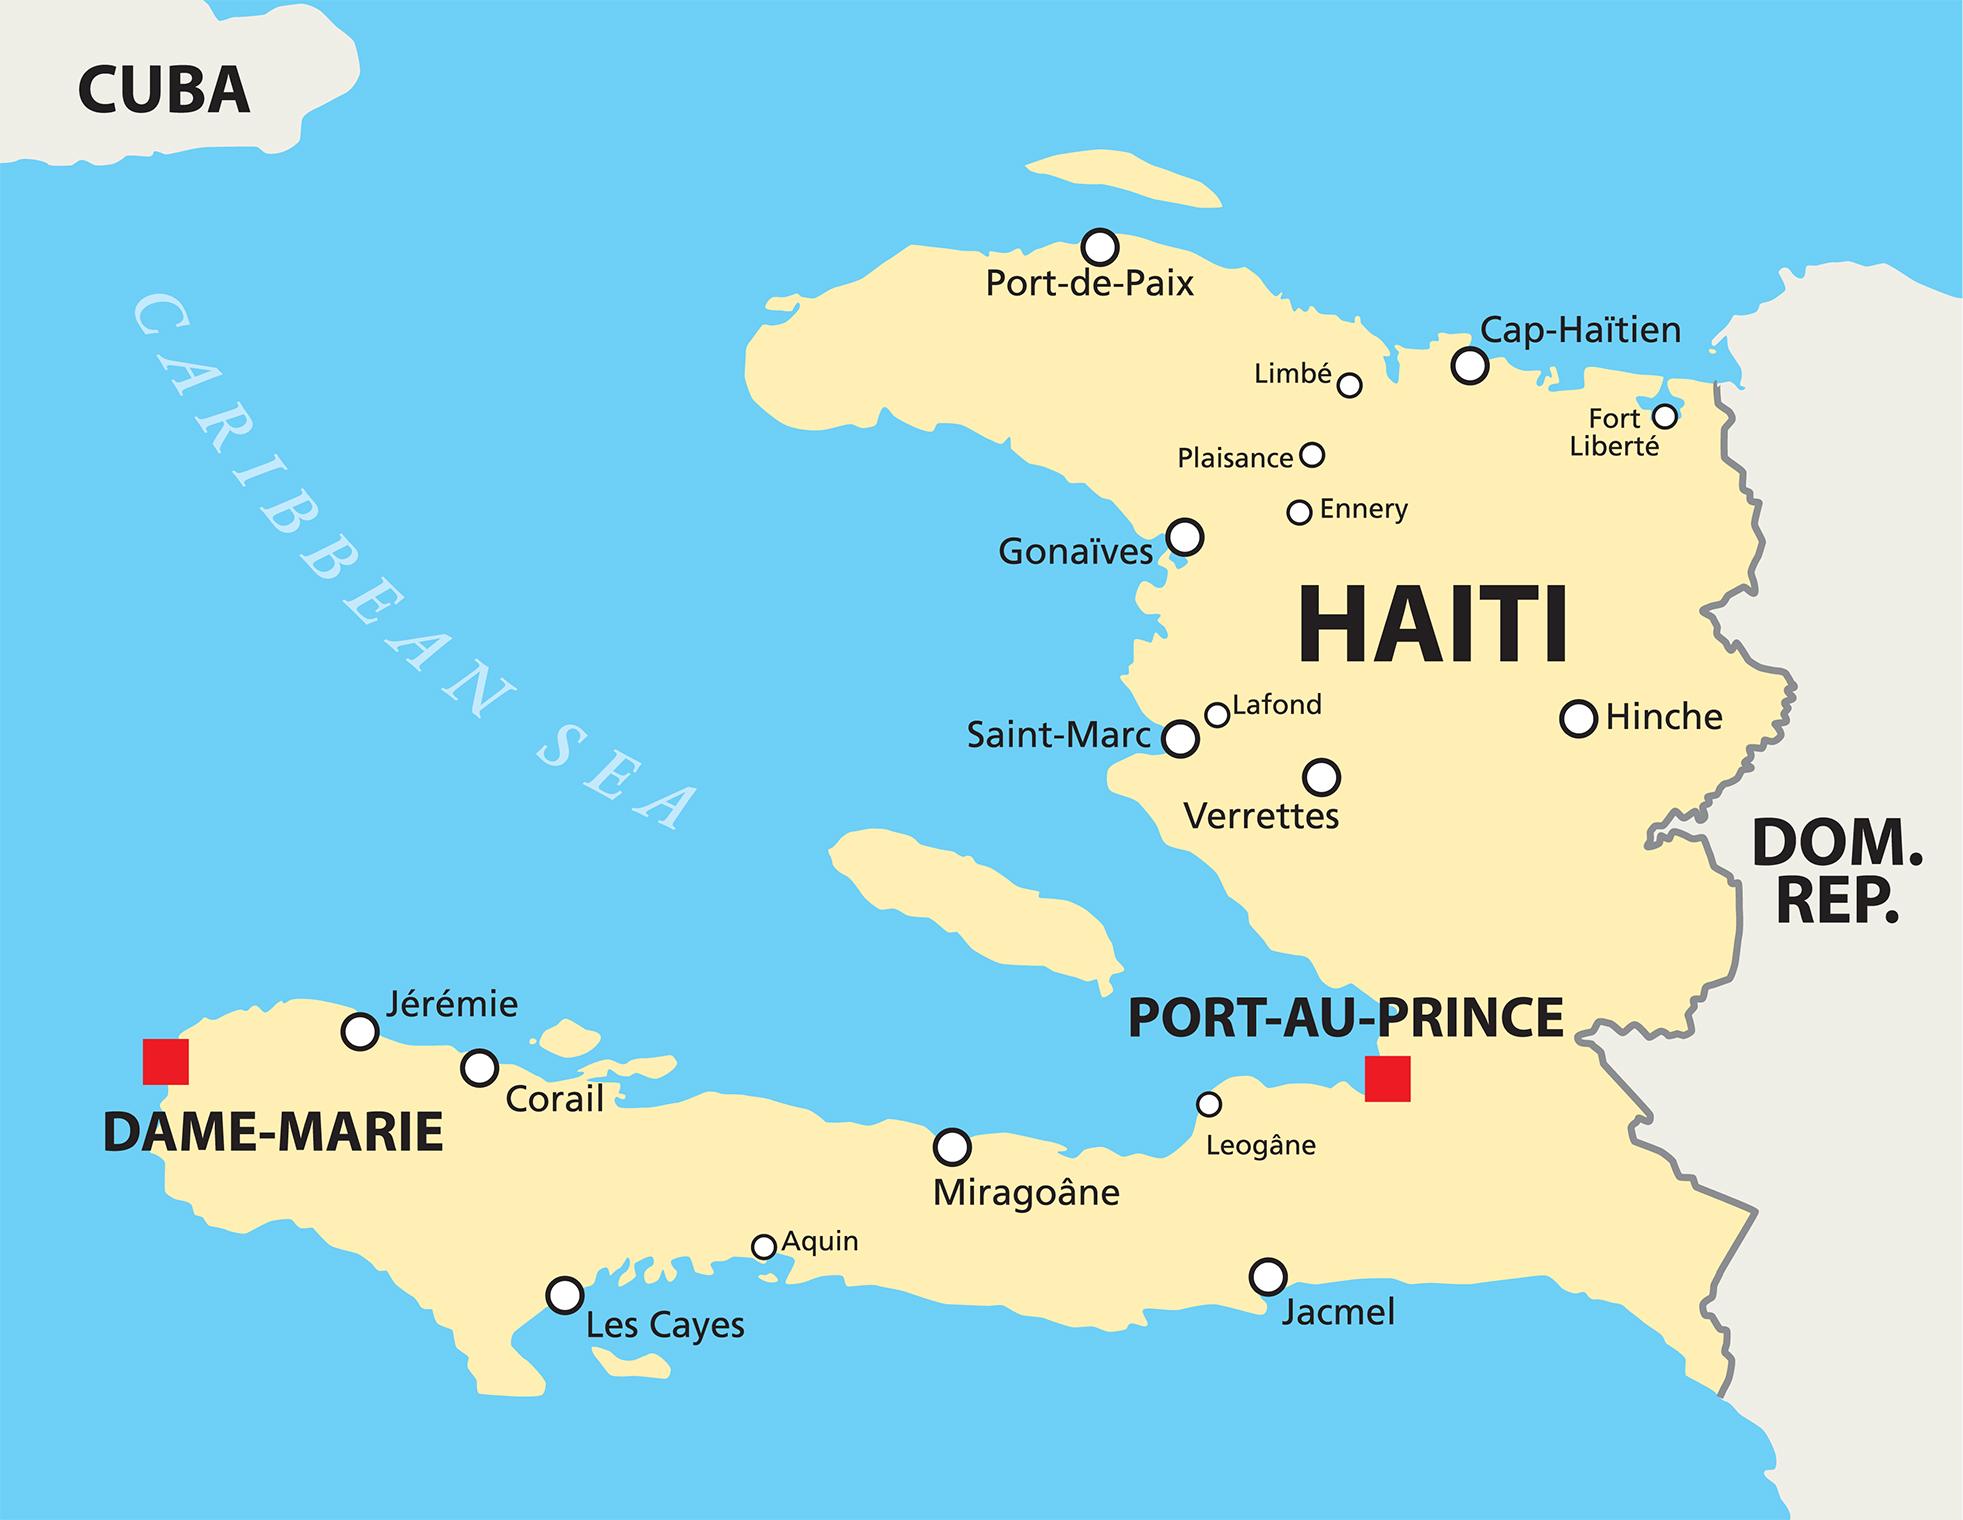 Image Haiti mapjpg Haiti FANDOM powered by Wikia